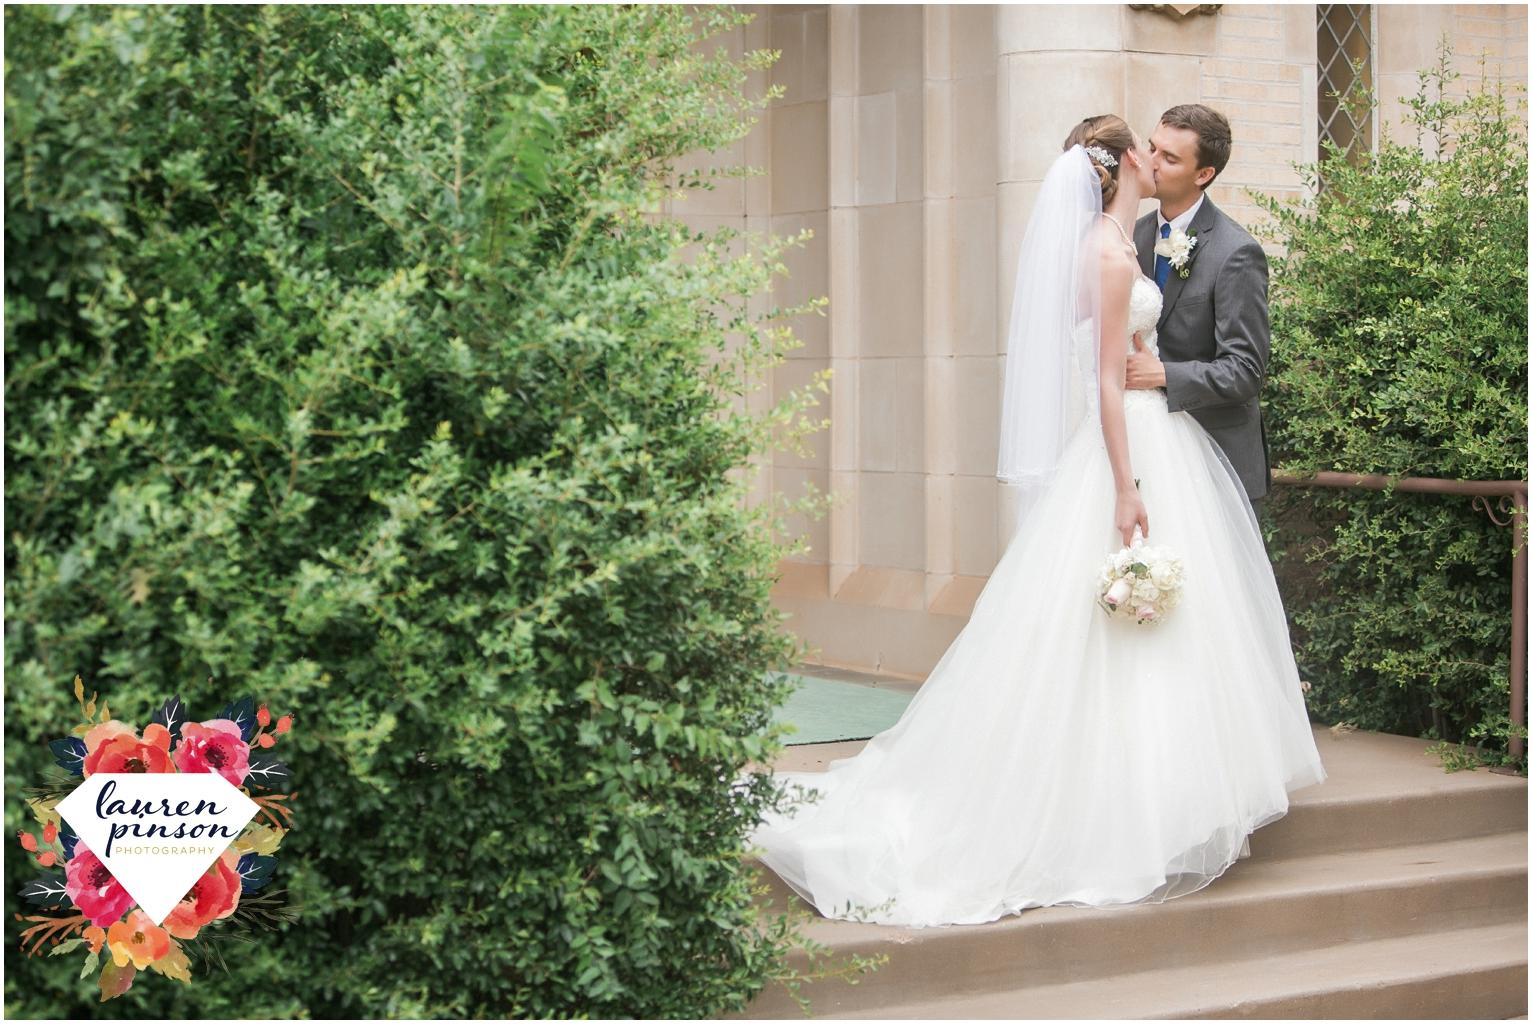 wichita-falls-wedding-photography-at-fain-presbyterian-church-and-the-wellington-timeless-classic-modern-photographer_1171.jpg